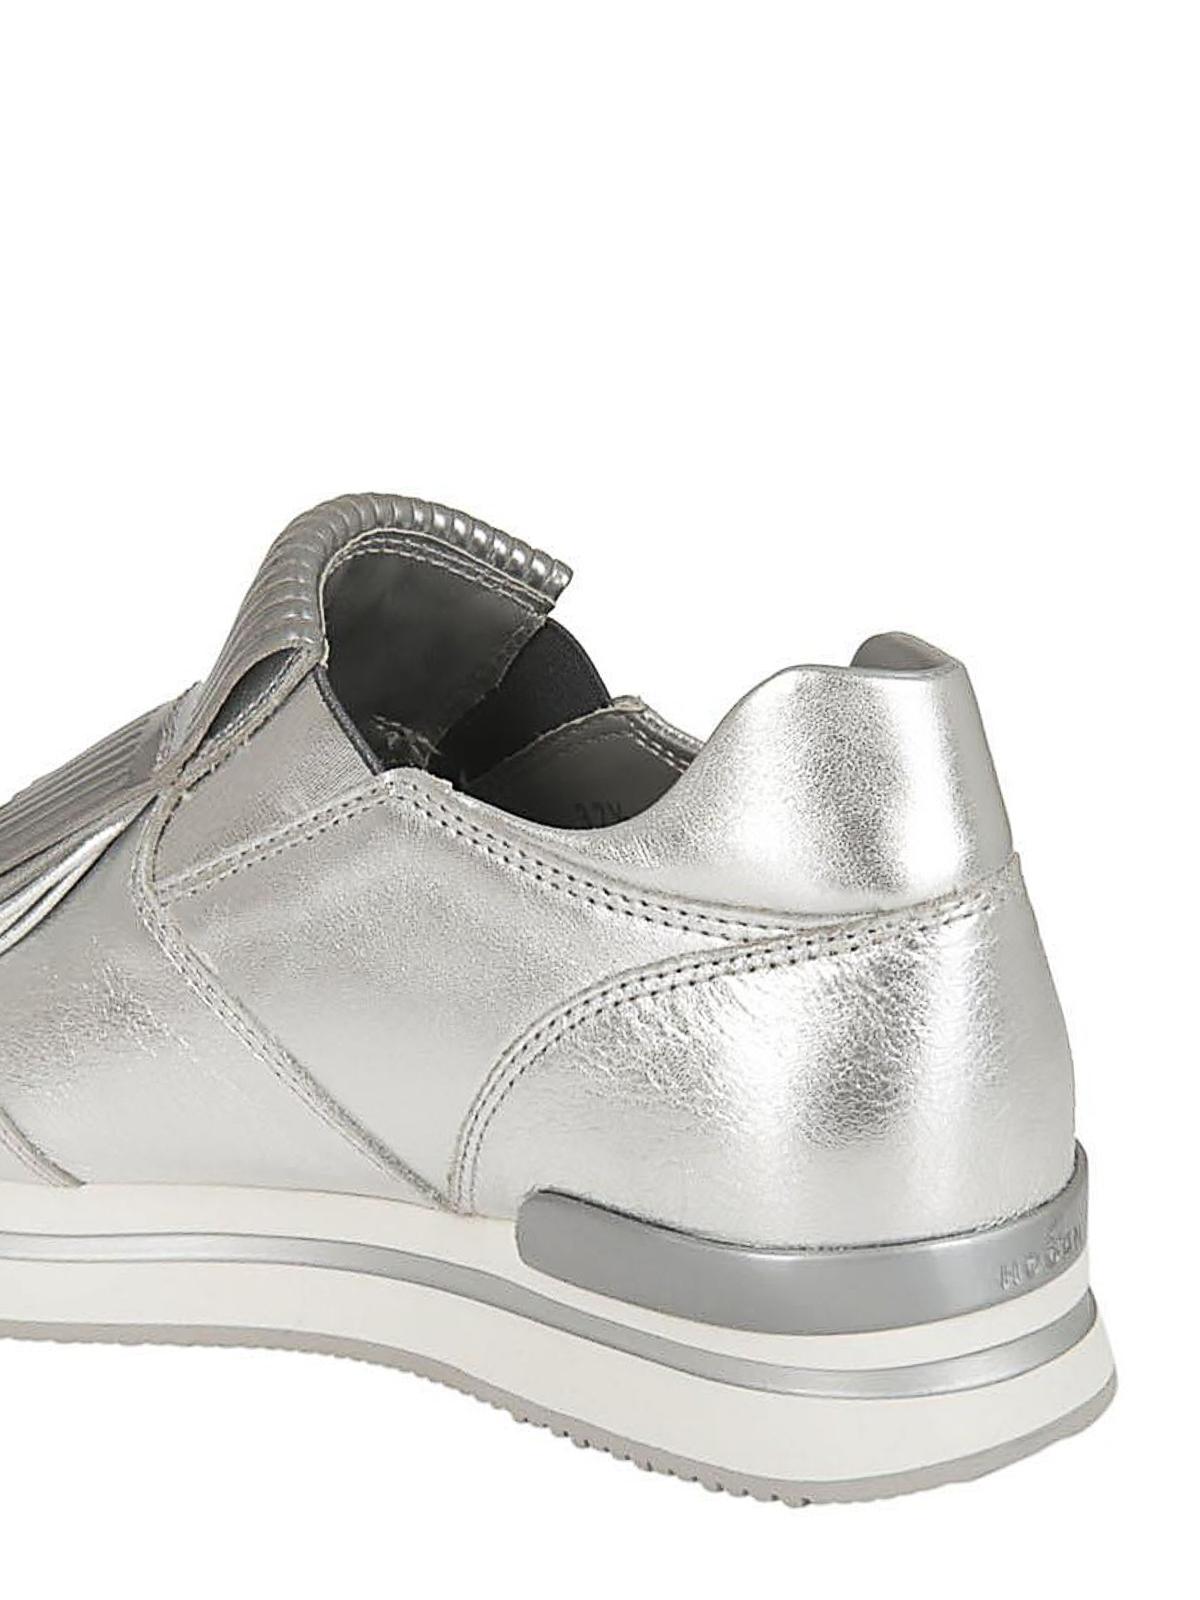 Hogan - H222 silver fringed slip-ons - trainers - HXW2220AH80IZDB200